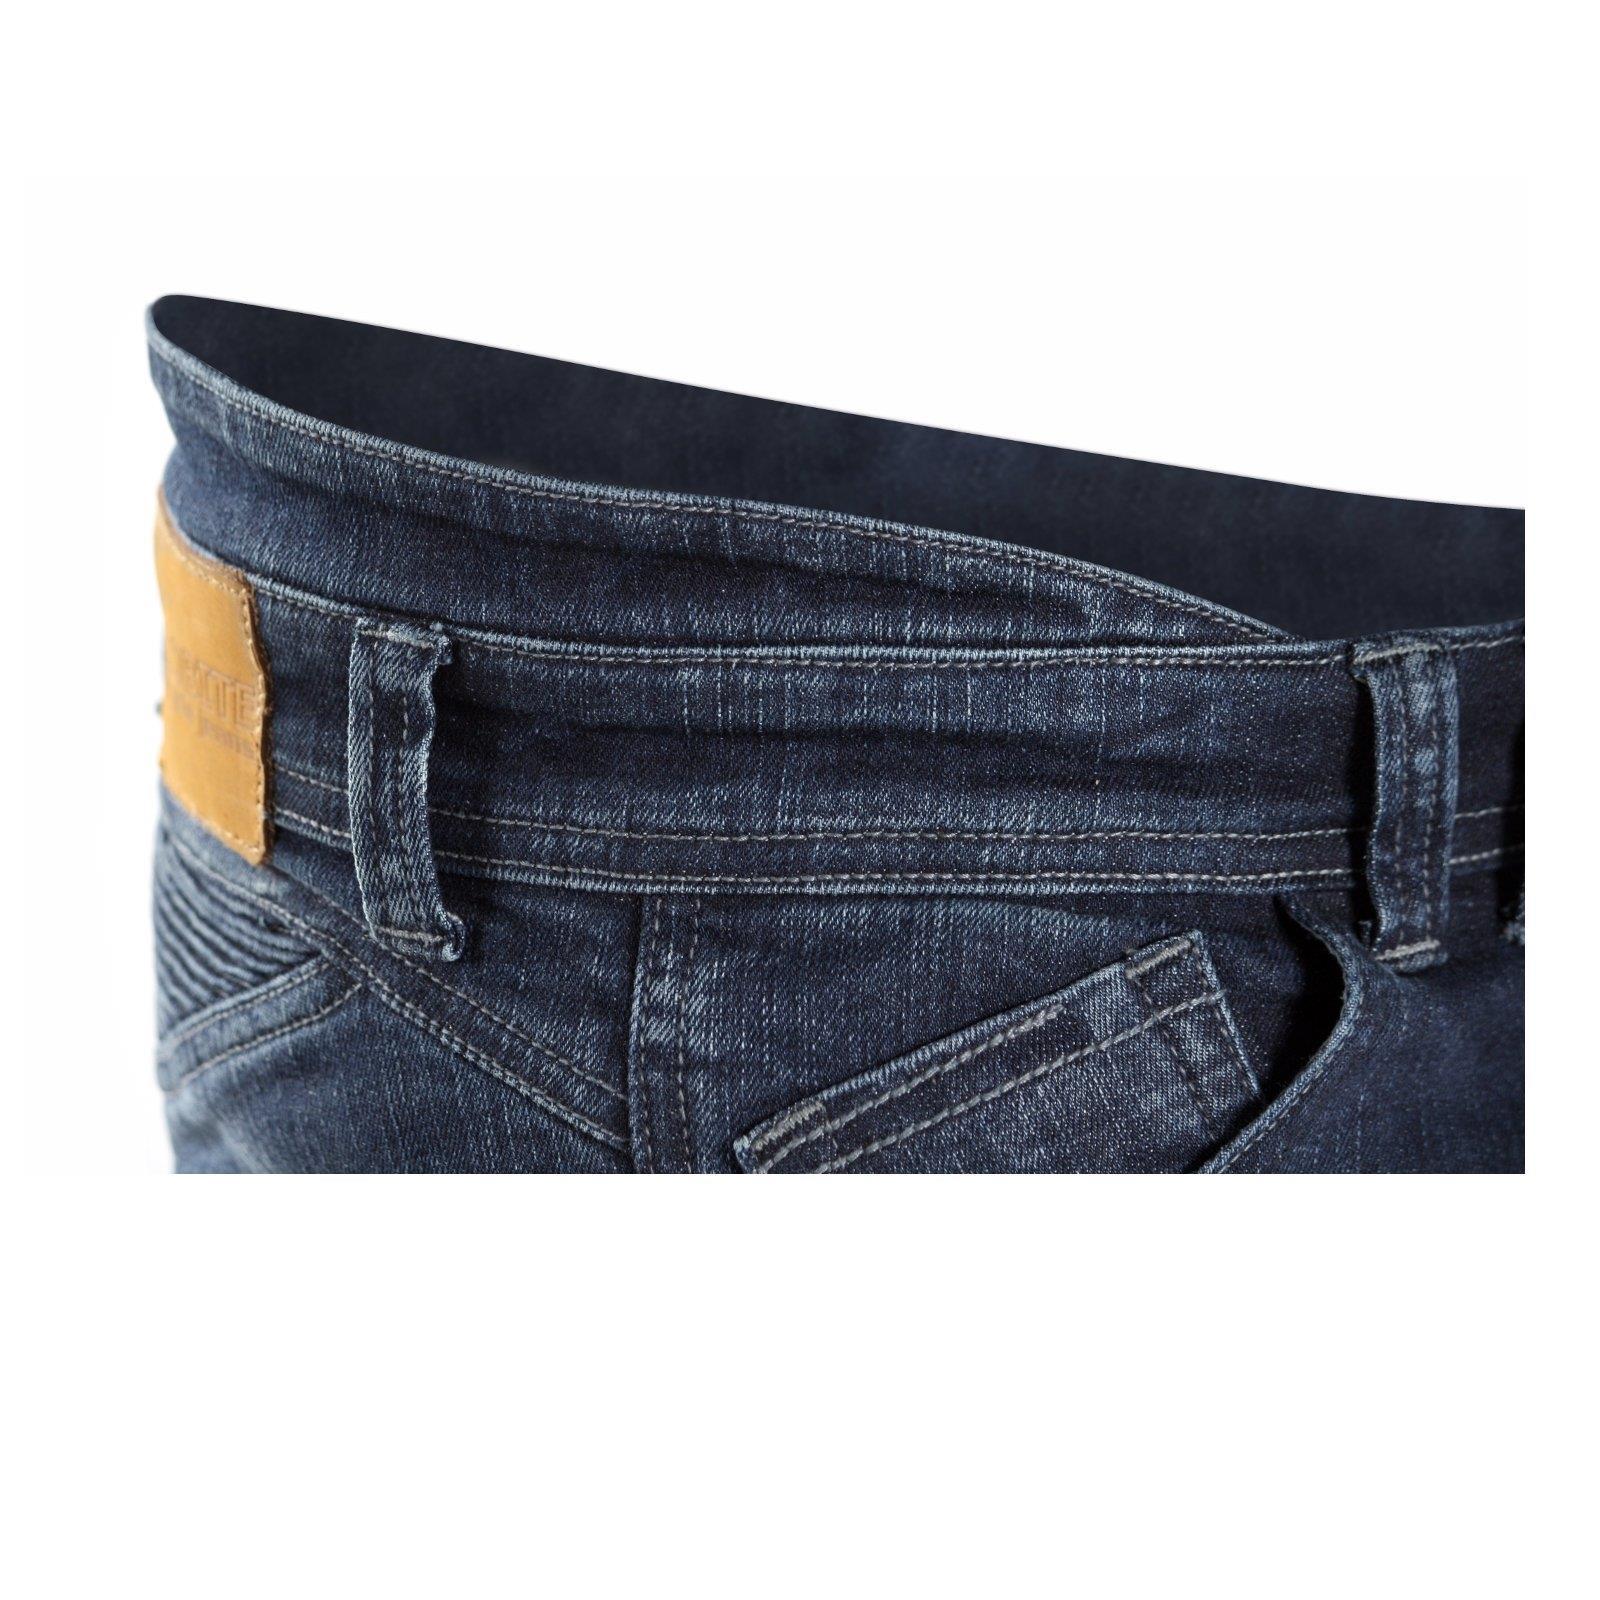 Trilobite-Pantaloni-Moto-Jeans-Abbigliamento-Parado-MICAS-URBAN-DUAL-PANTS-ACID miniatura 19